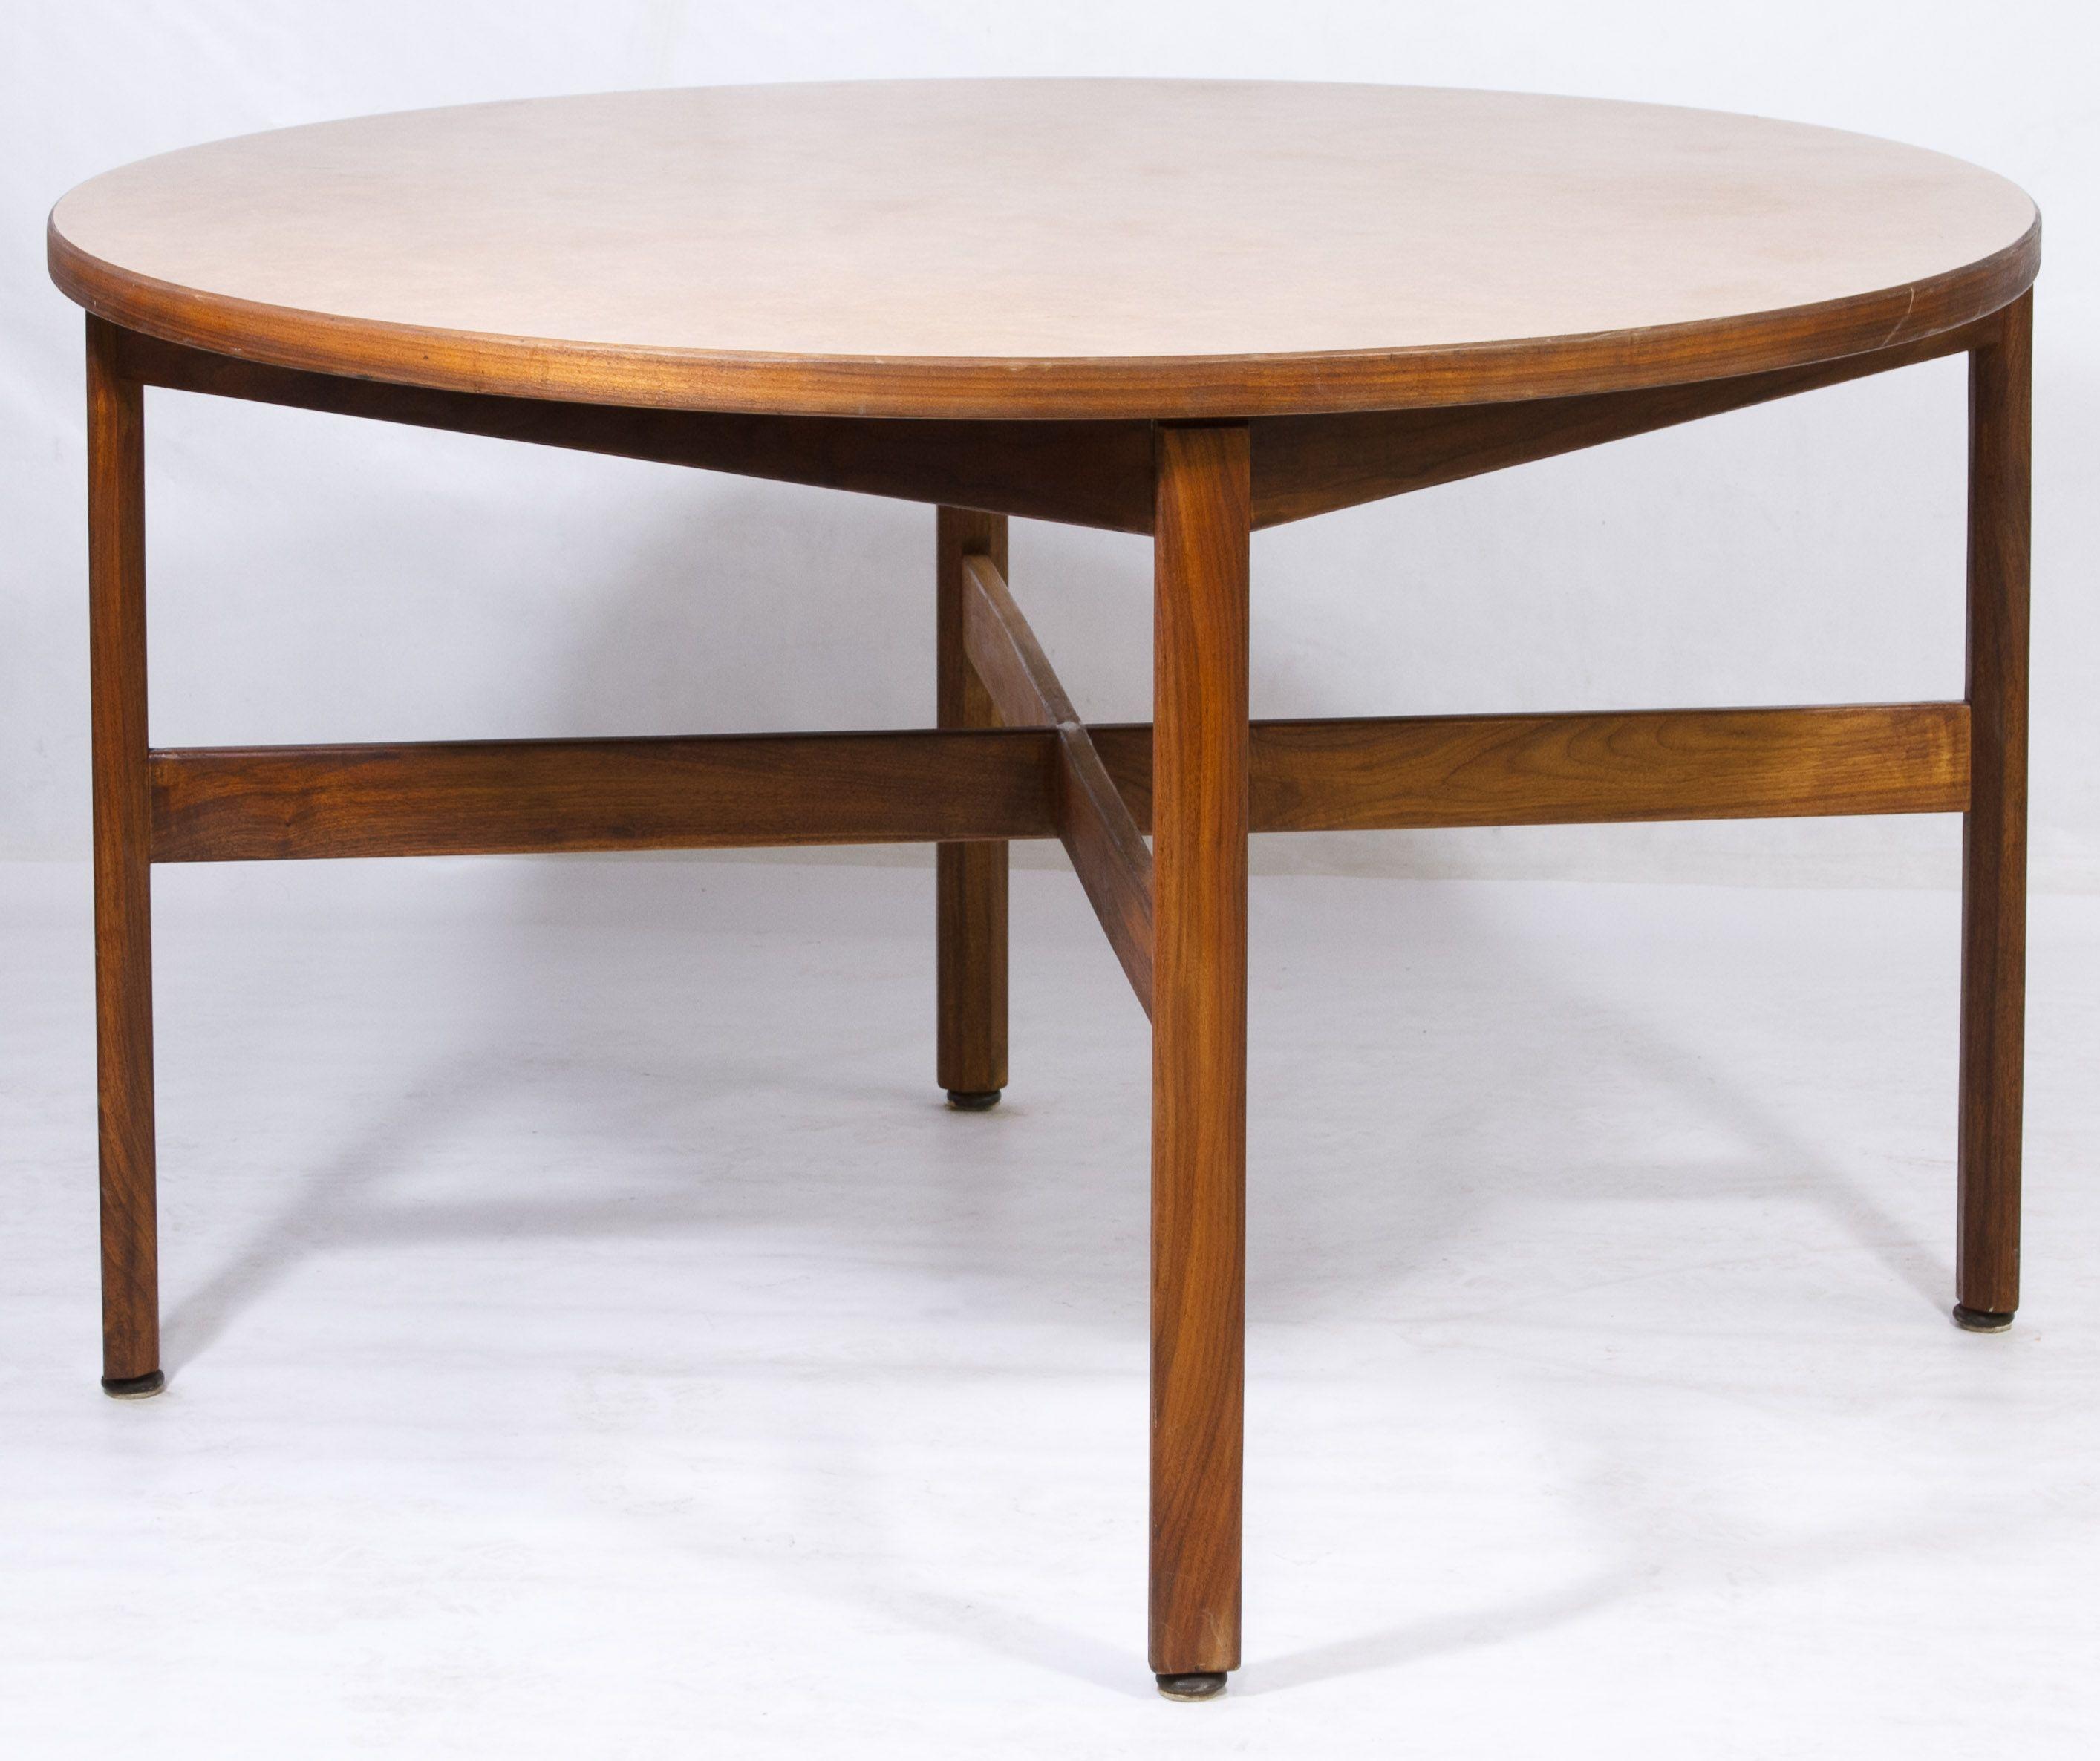 Lot 67 mid century modern walnut table by jens risom round table lot 67 mid century modern walnut table by jens risom round table on geotapseo Choice Image